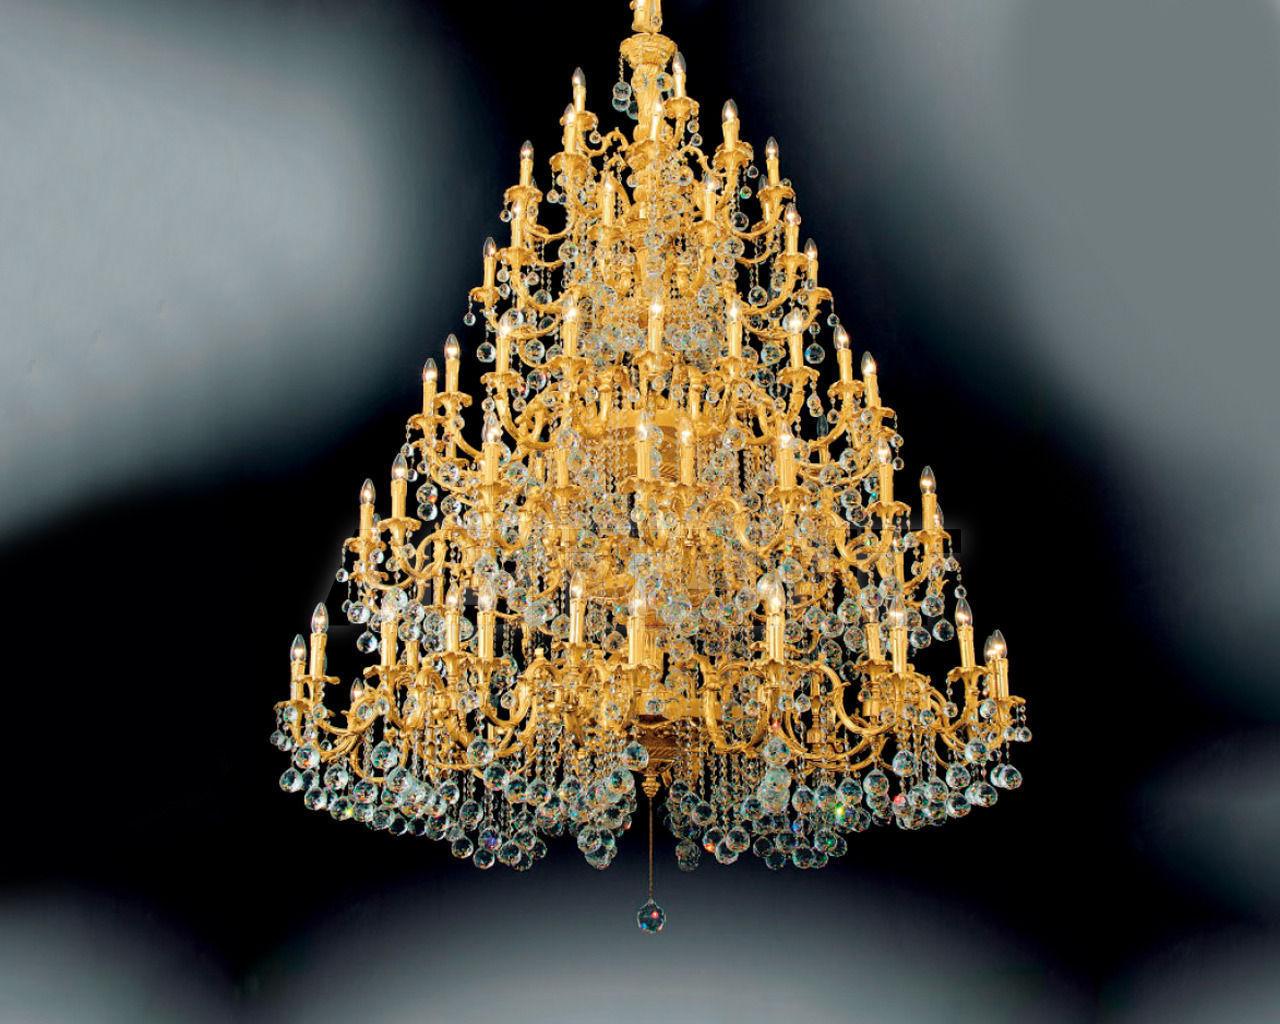 Купить Люстра Asfour Crystal Crystal 2013 CH 812/80*140 Chrome Ball*Octagons